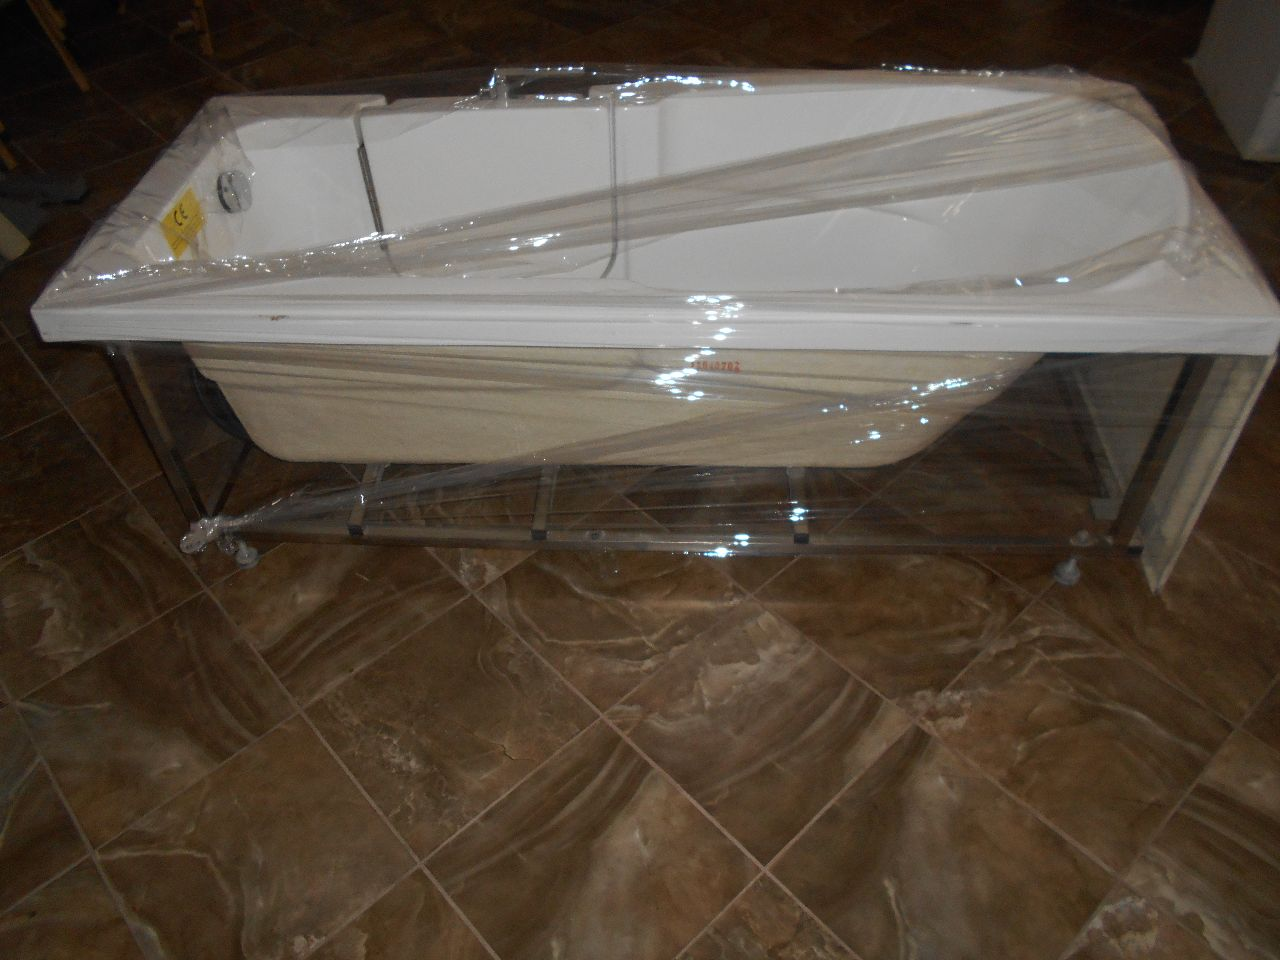 Vasche Da Bagno Apertura Laterale Misure : Vasca da bagno con apertura laterale ivg di lamezia terme